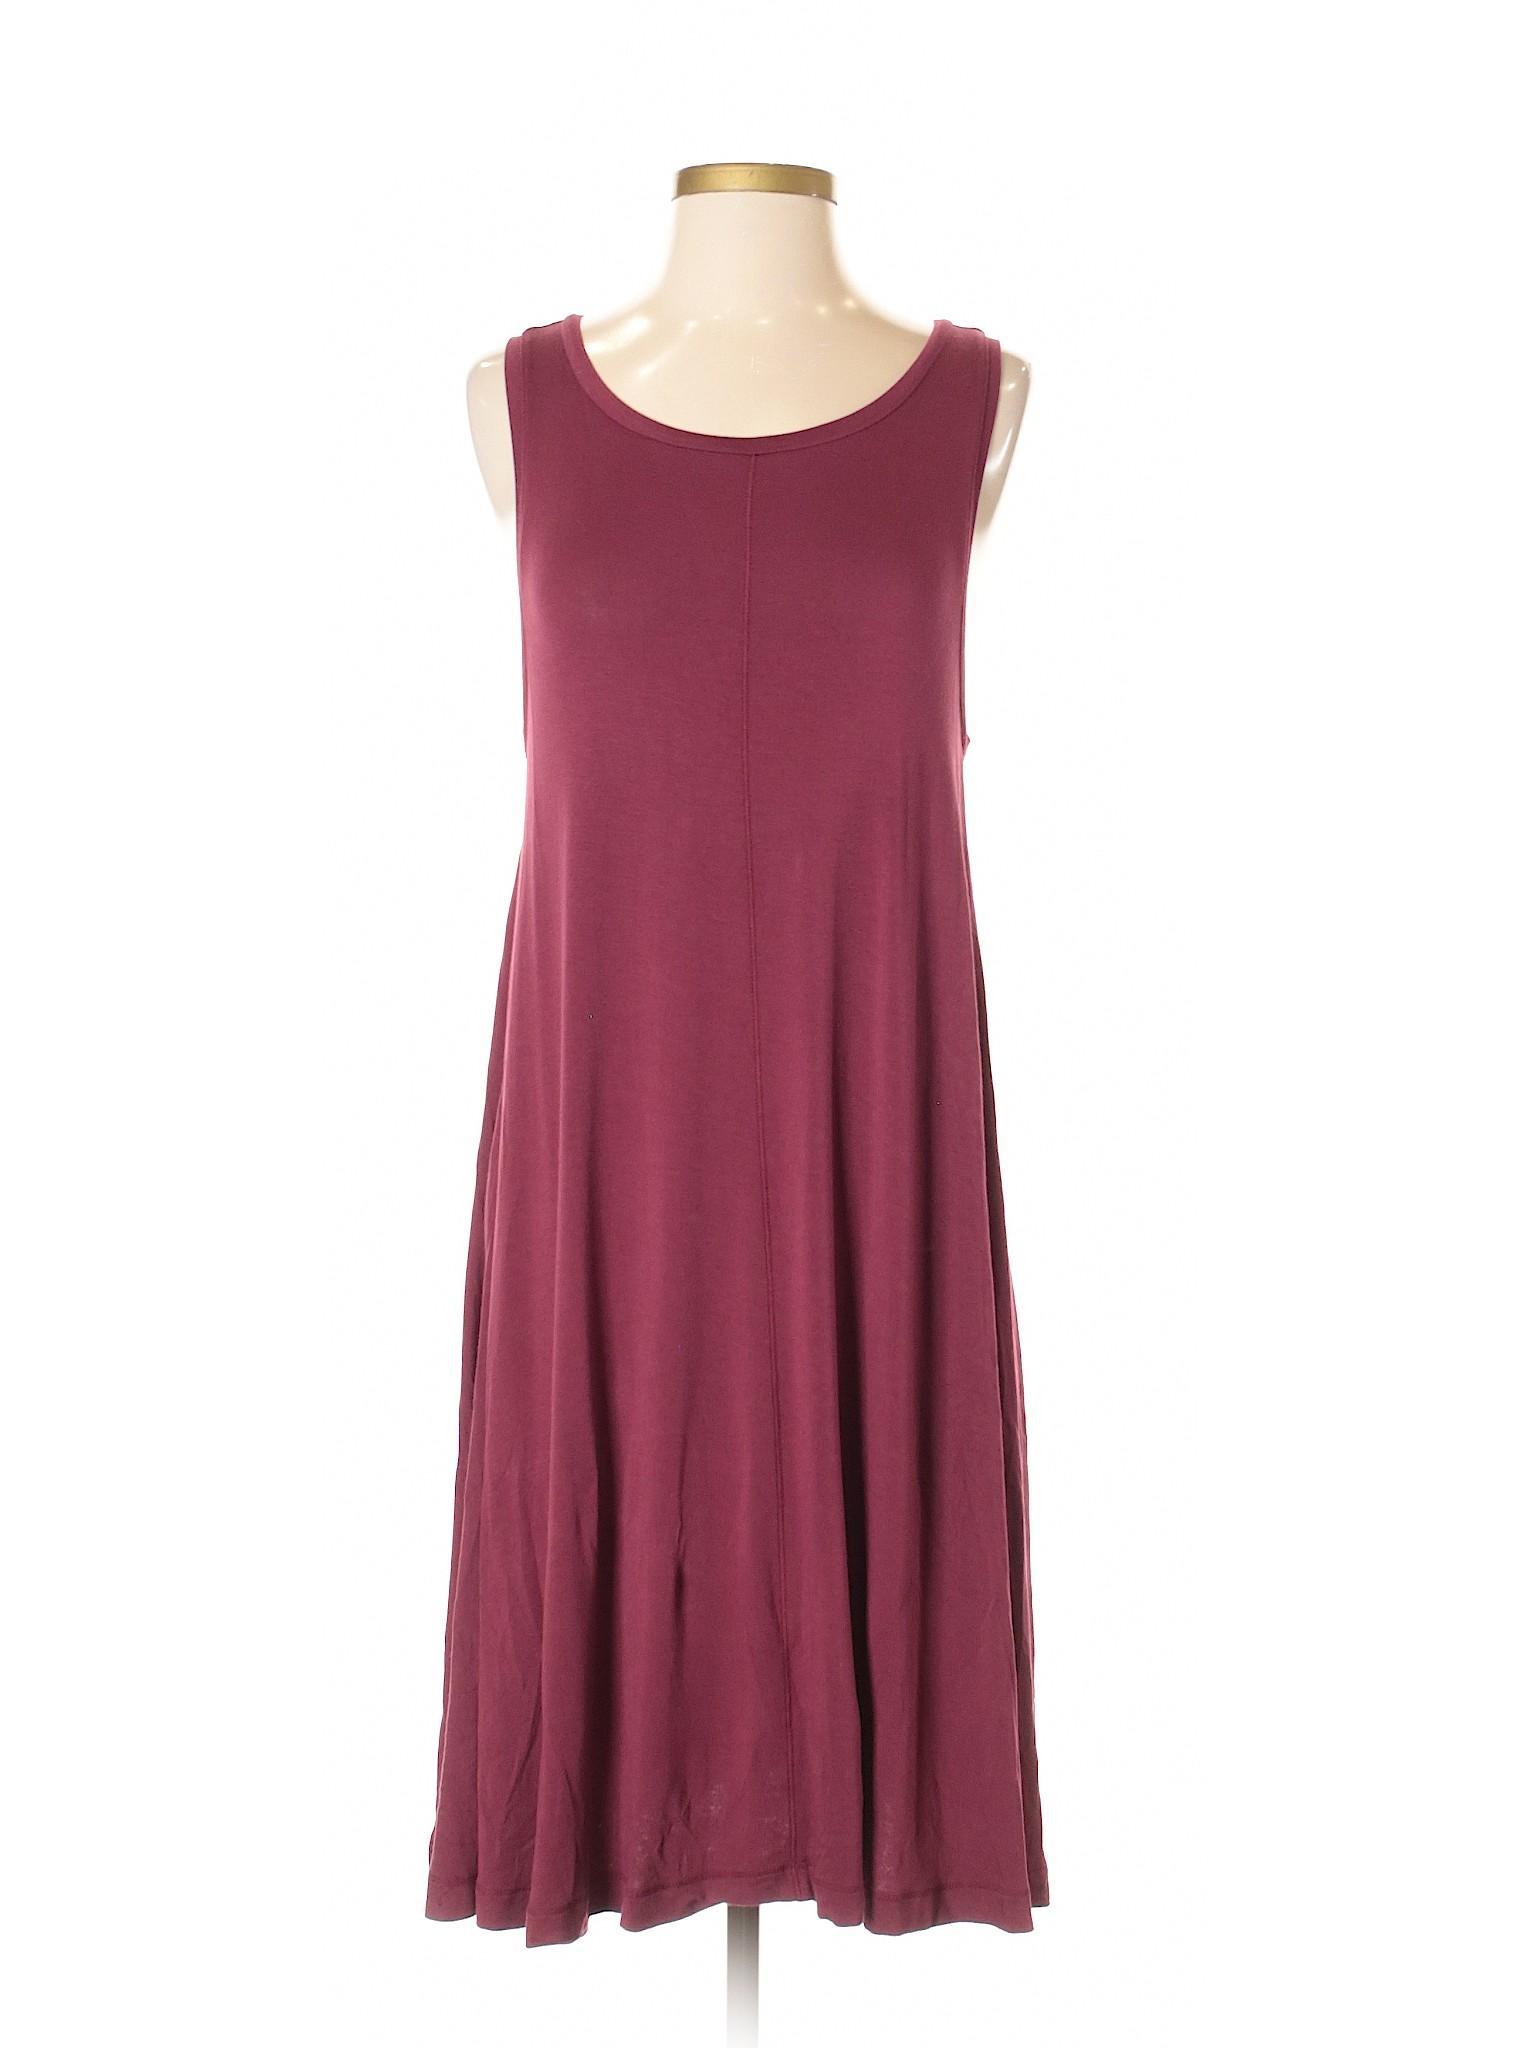 winter Dress Taylor Boutique LOFT Ann Casual PwqRAACU7x